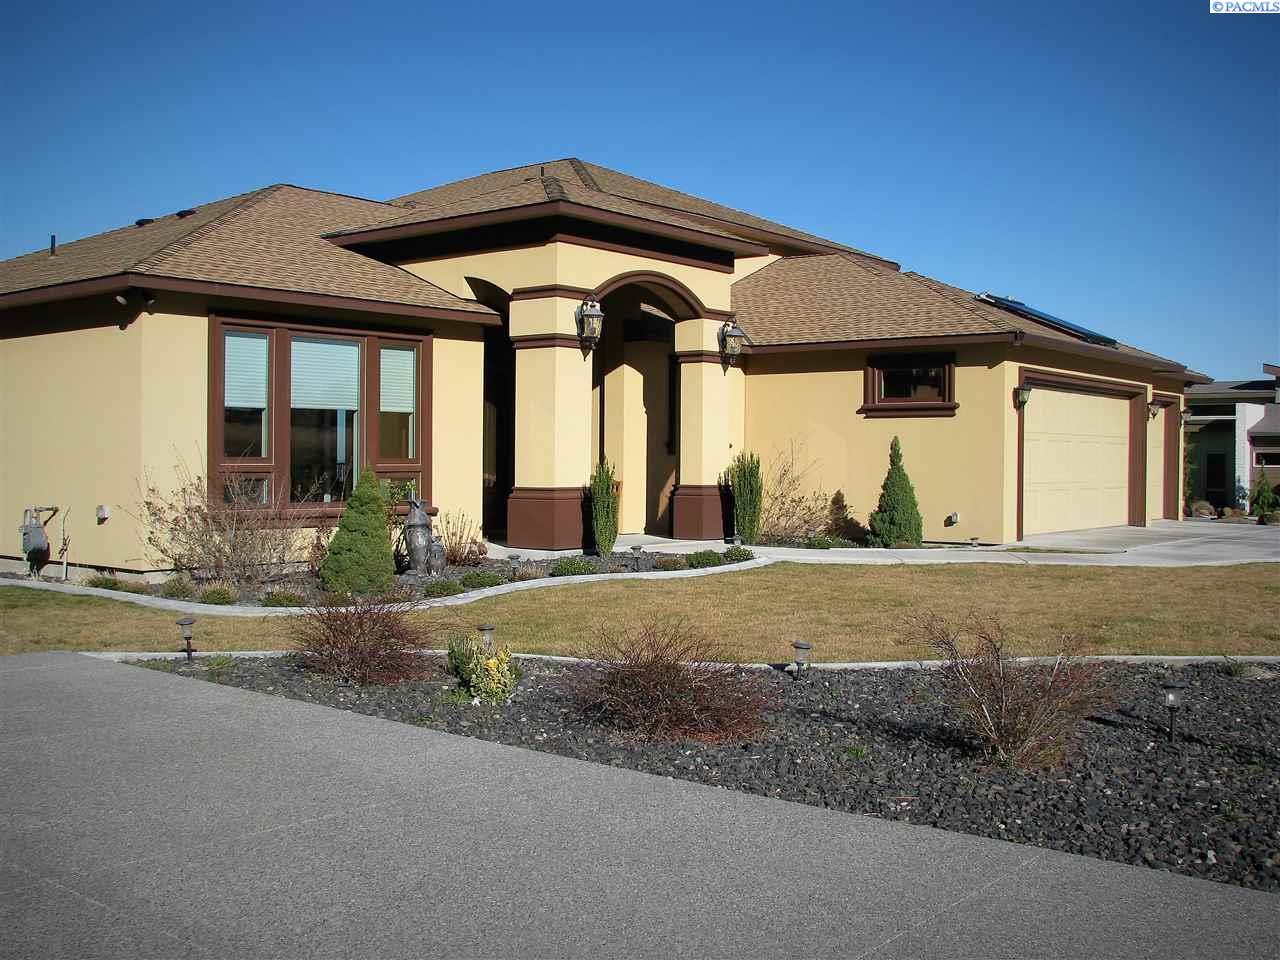 Single Family Home for Sale at 1261 Plateau Drive 1261 Plateau Drive Richland, Washington 99352 United States